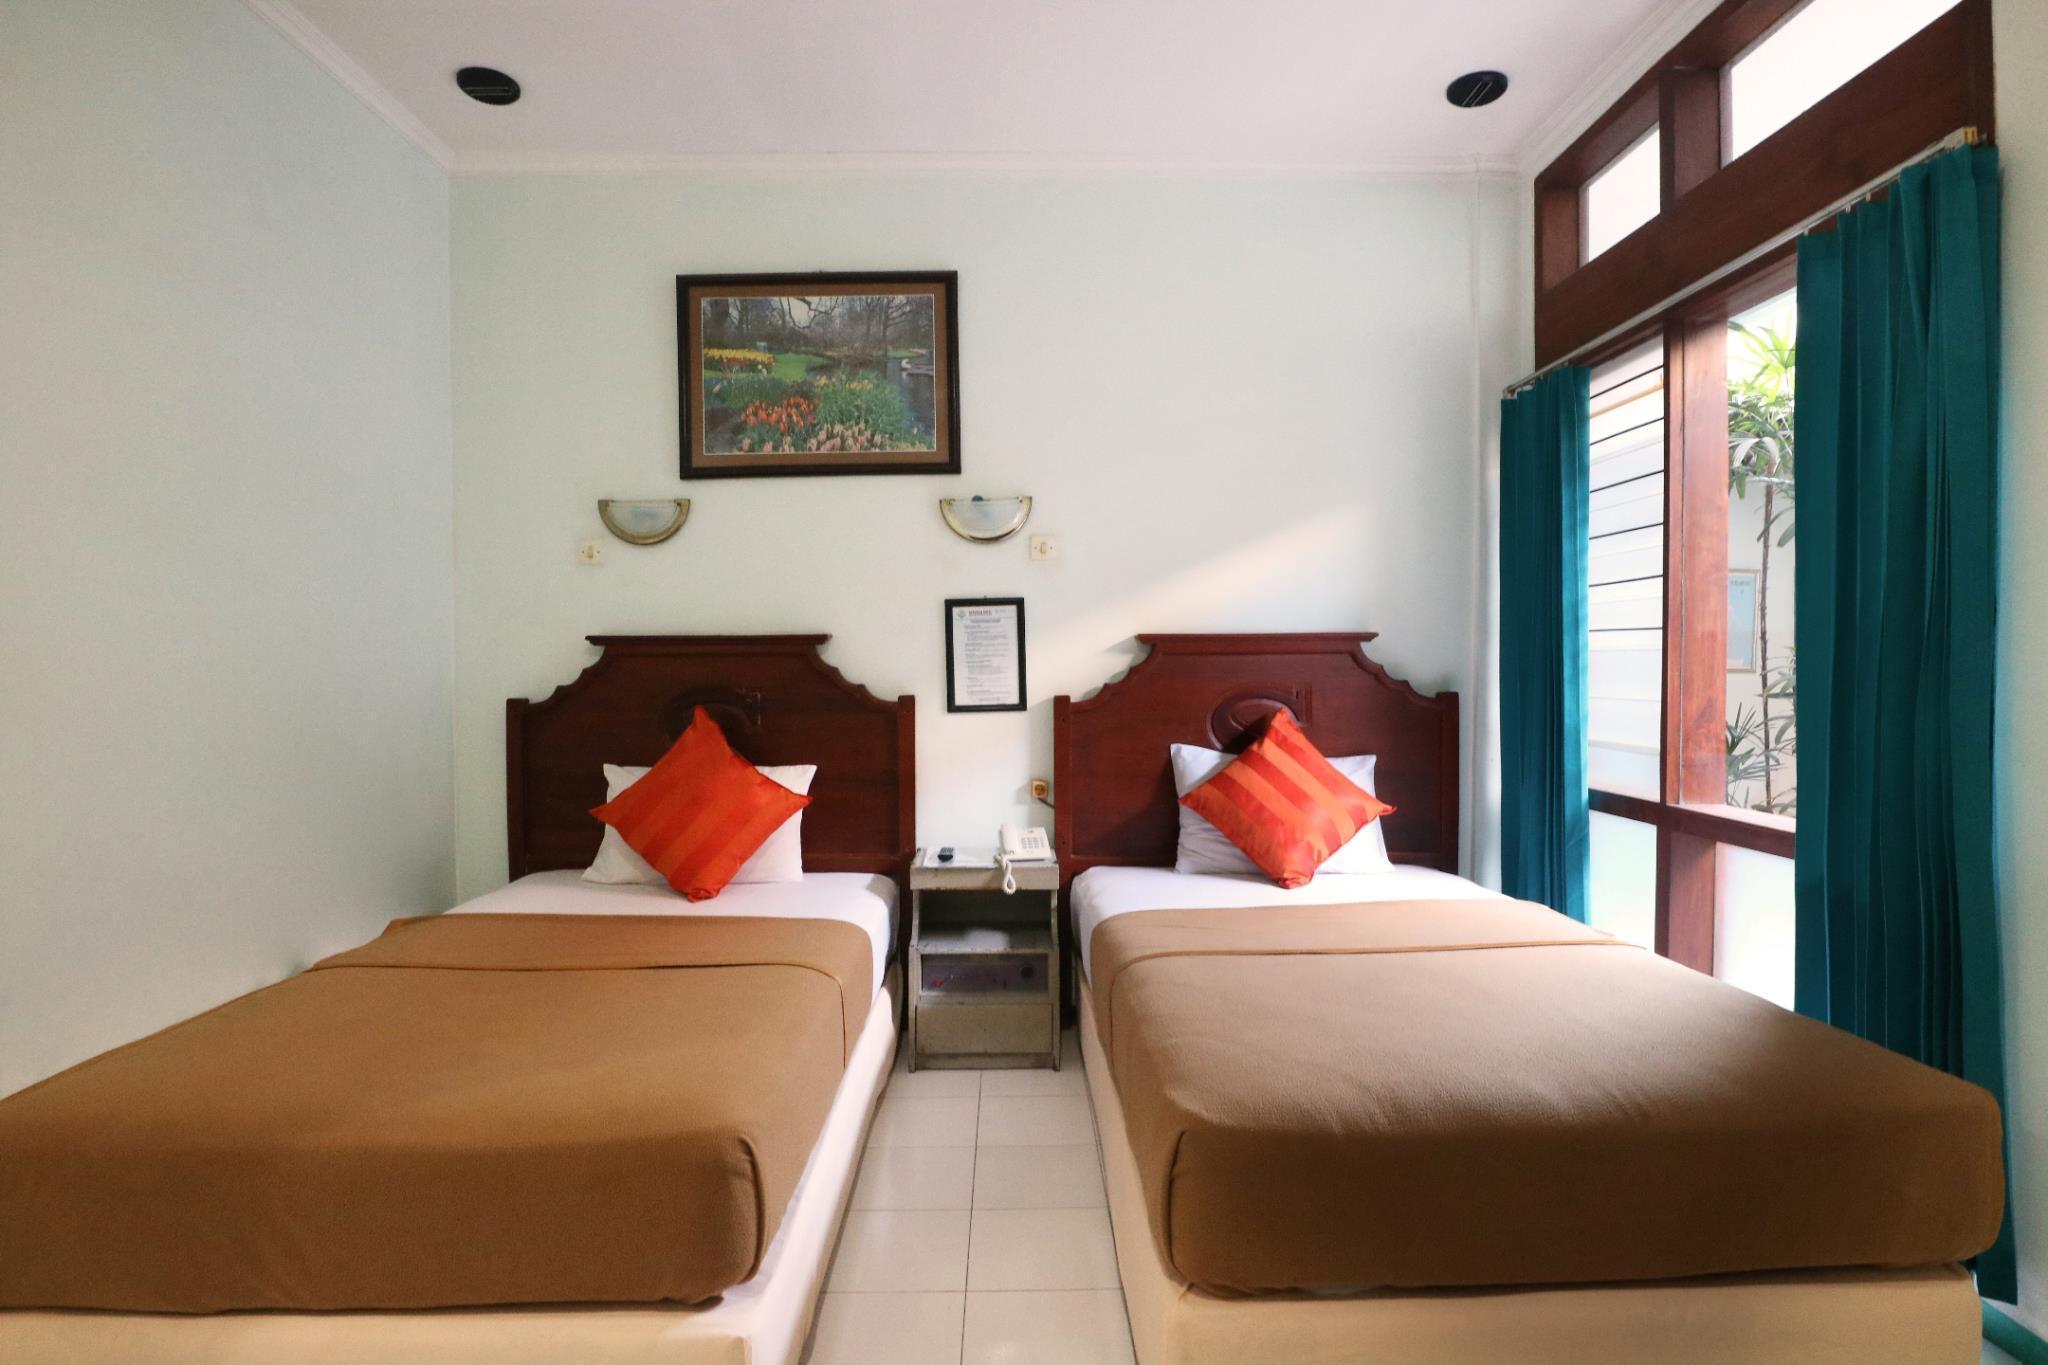 Hotel Paprica 1 Hotels Near The Grand City Mall Surabaya Best Hotel Rates Near